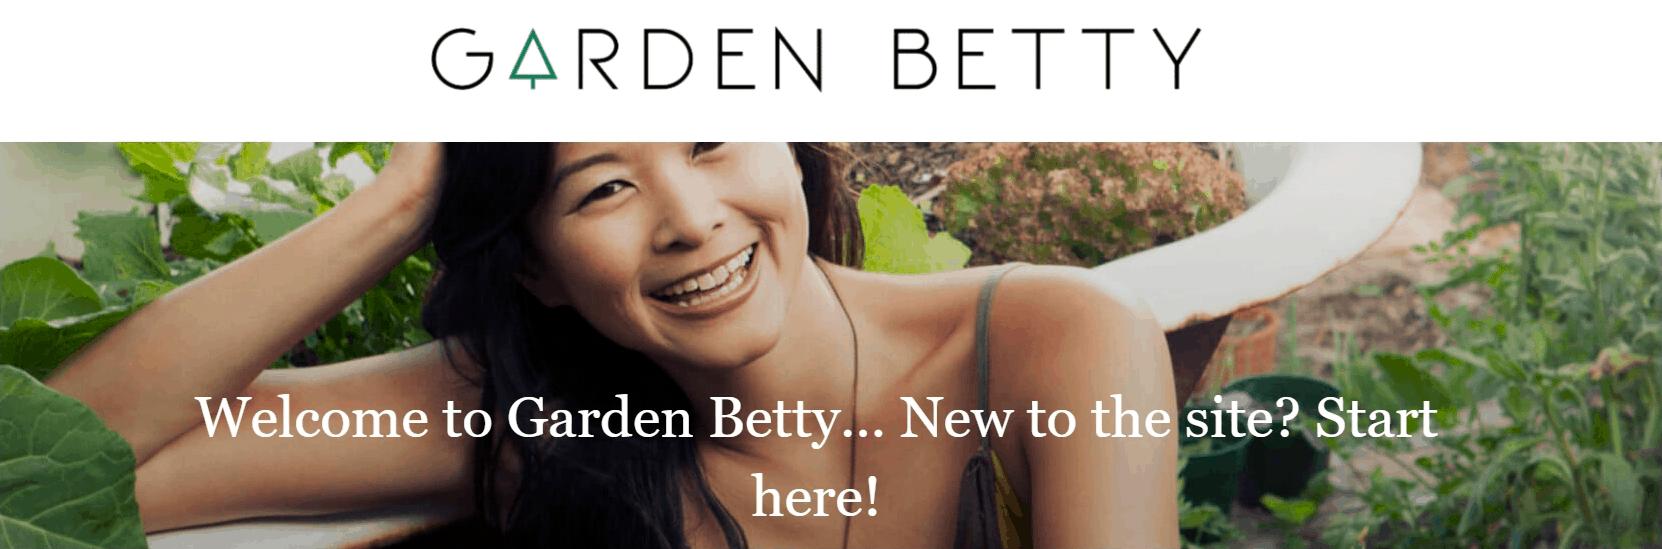 Garden Betty Blog banner